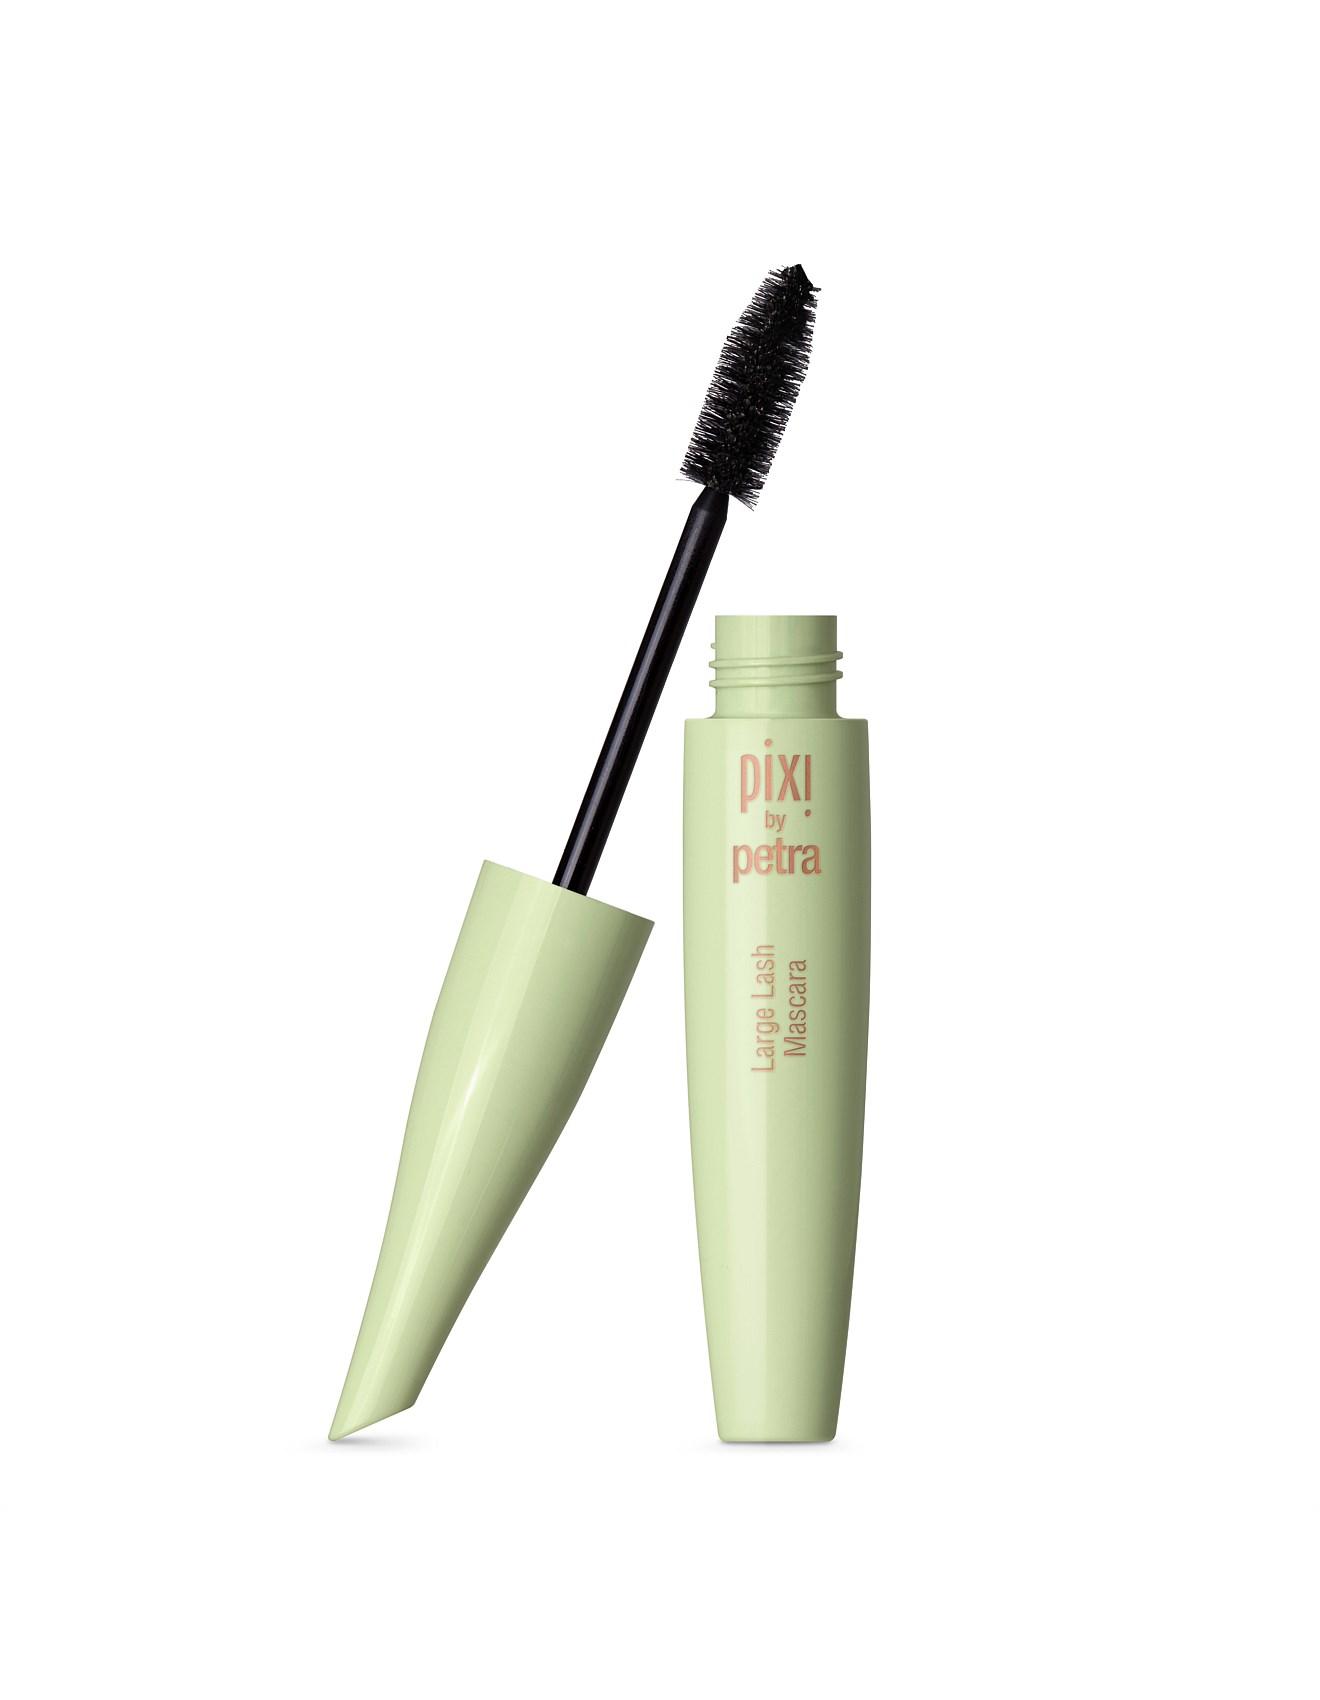 Pixi Large Lash Mascara, No. 1 Bold Black, 0.41 fl oz